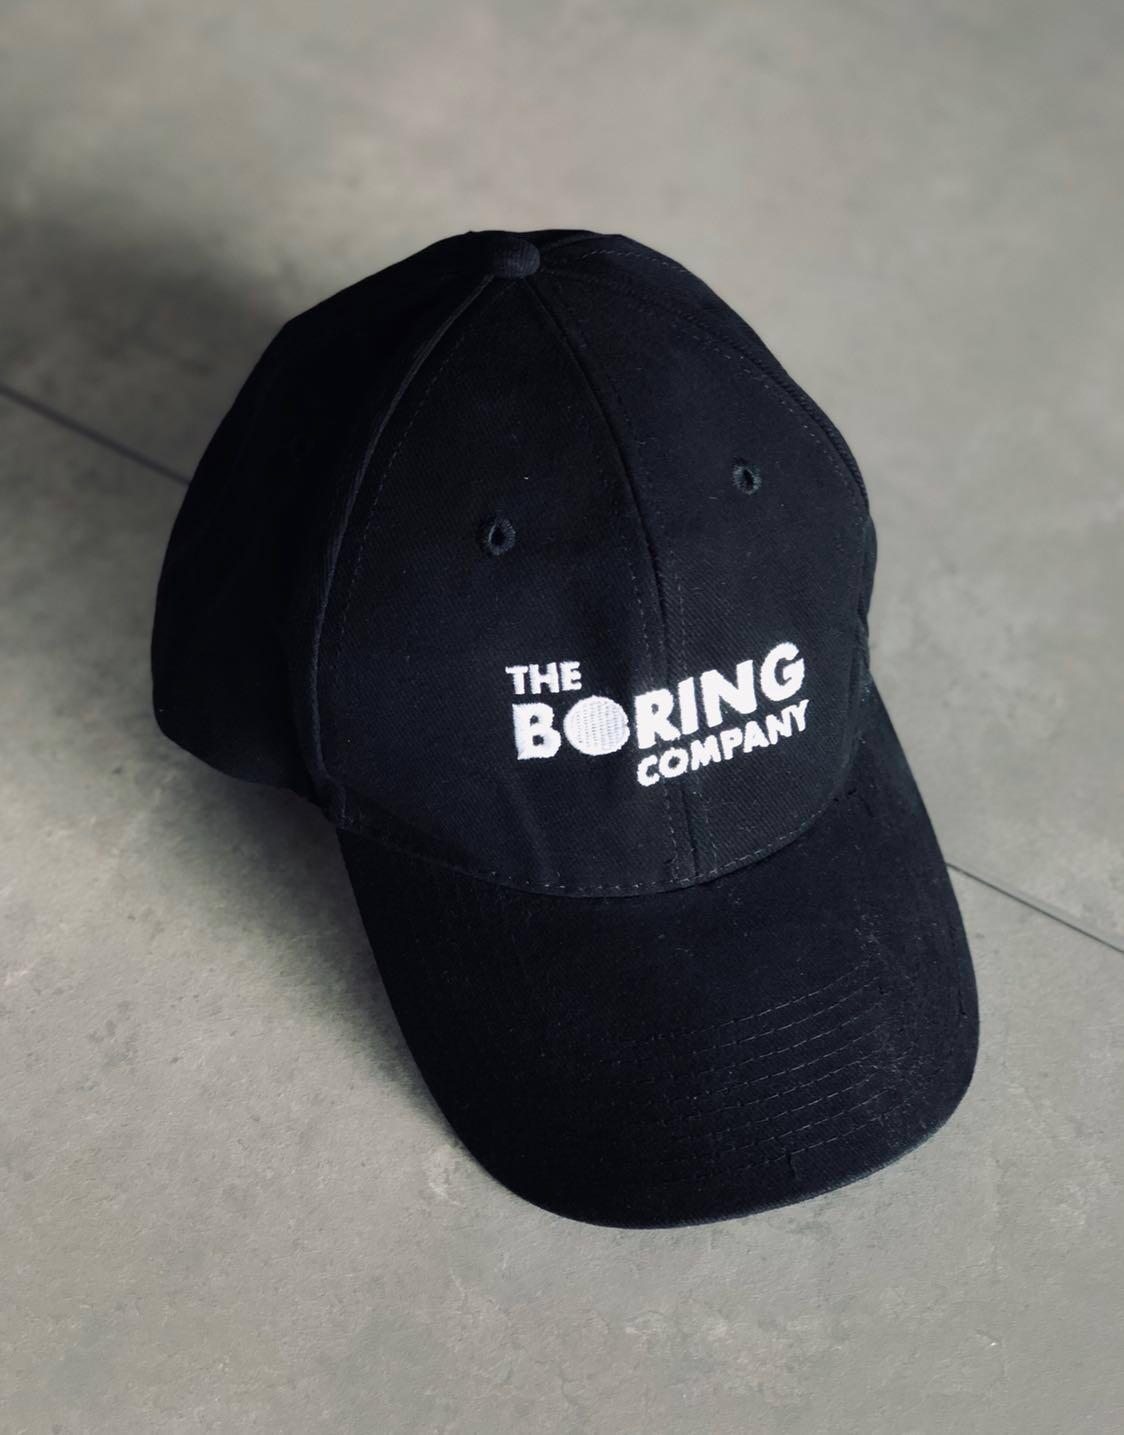 37221f8b747c3 NEW The Boring Company Hat Cap - Limited Edition Elon Musk Snapback ...